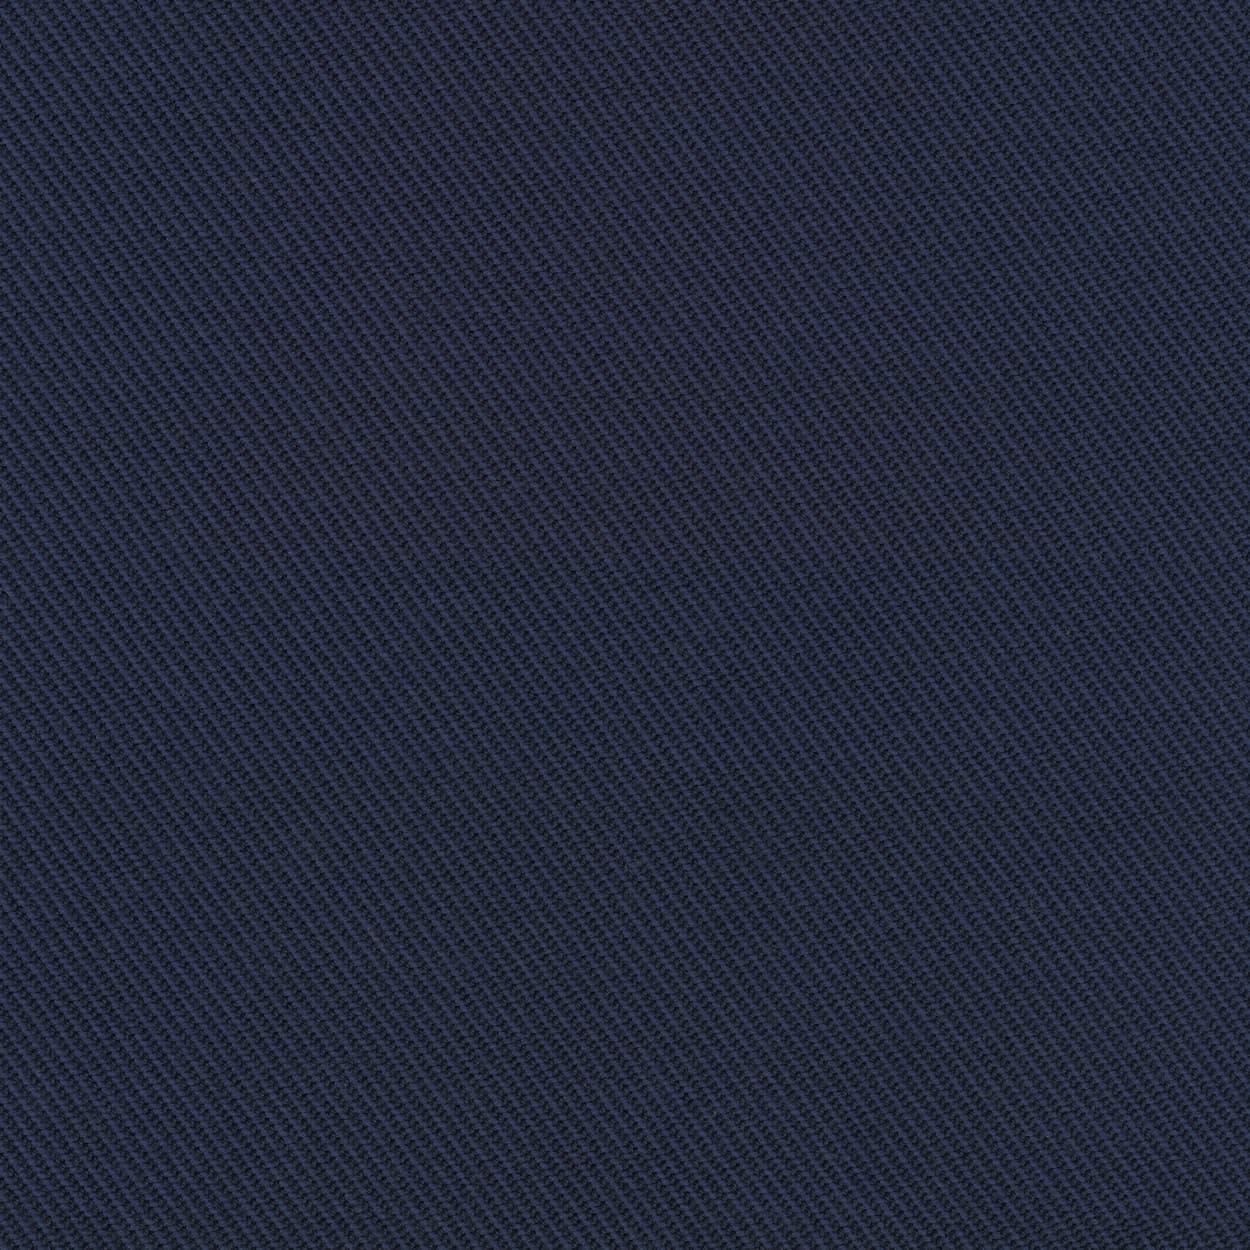 Twill Weave 780